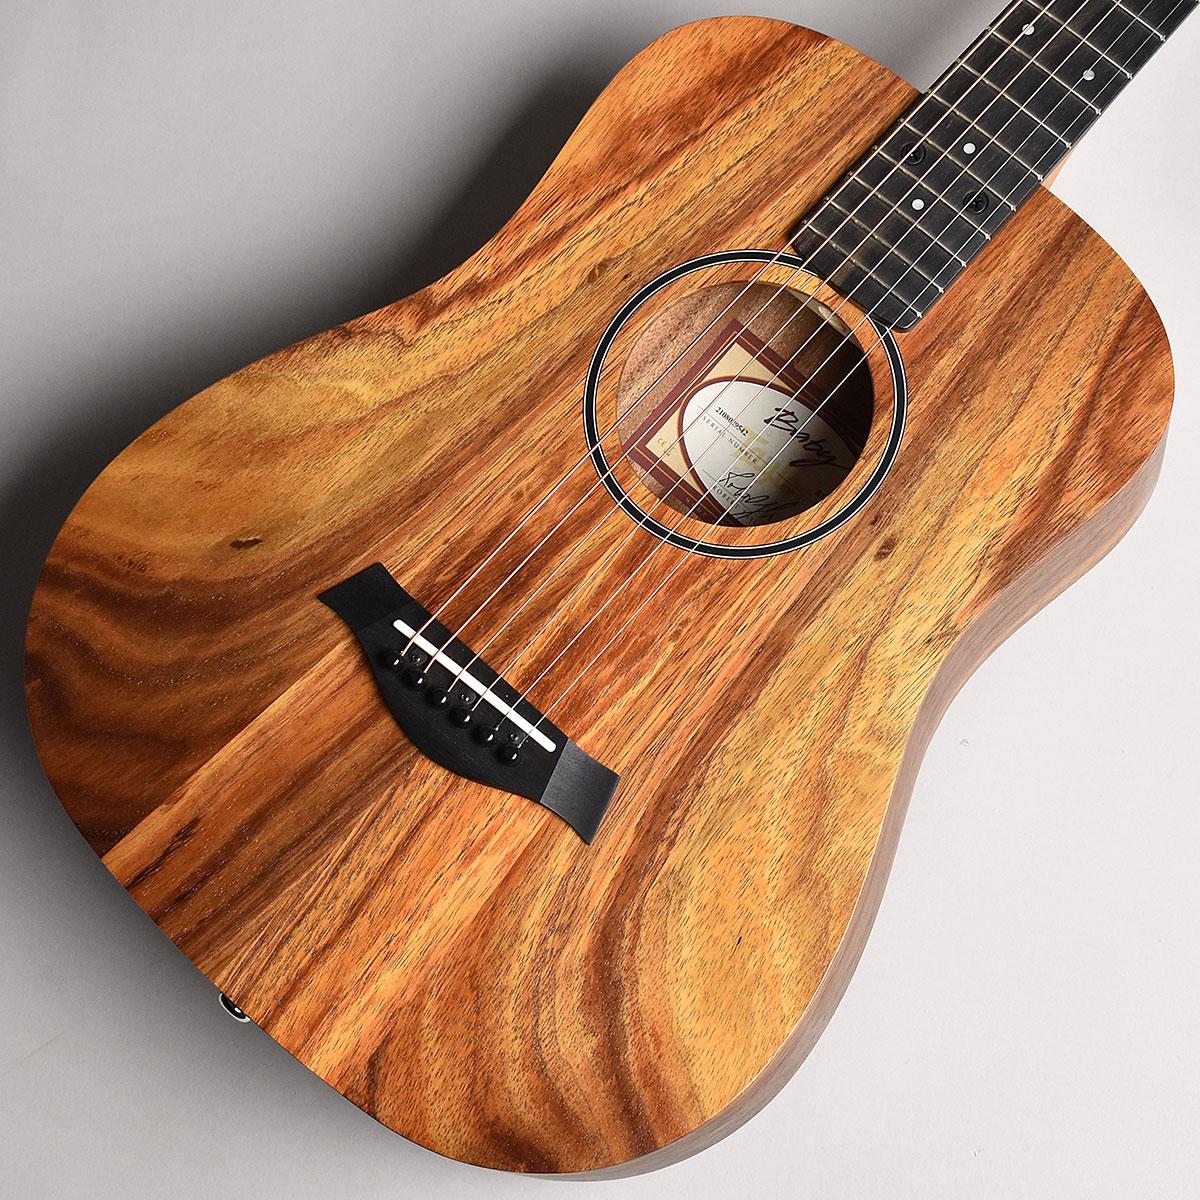 Taylor Baby Taylor-e Koa S/N:2108029542 ミニアコースティックギター【エレアコ】 【テイラー】【未展示品】